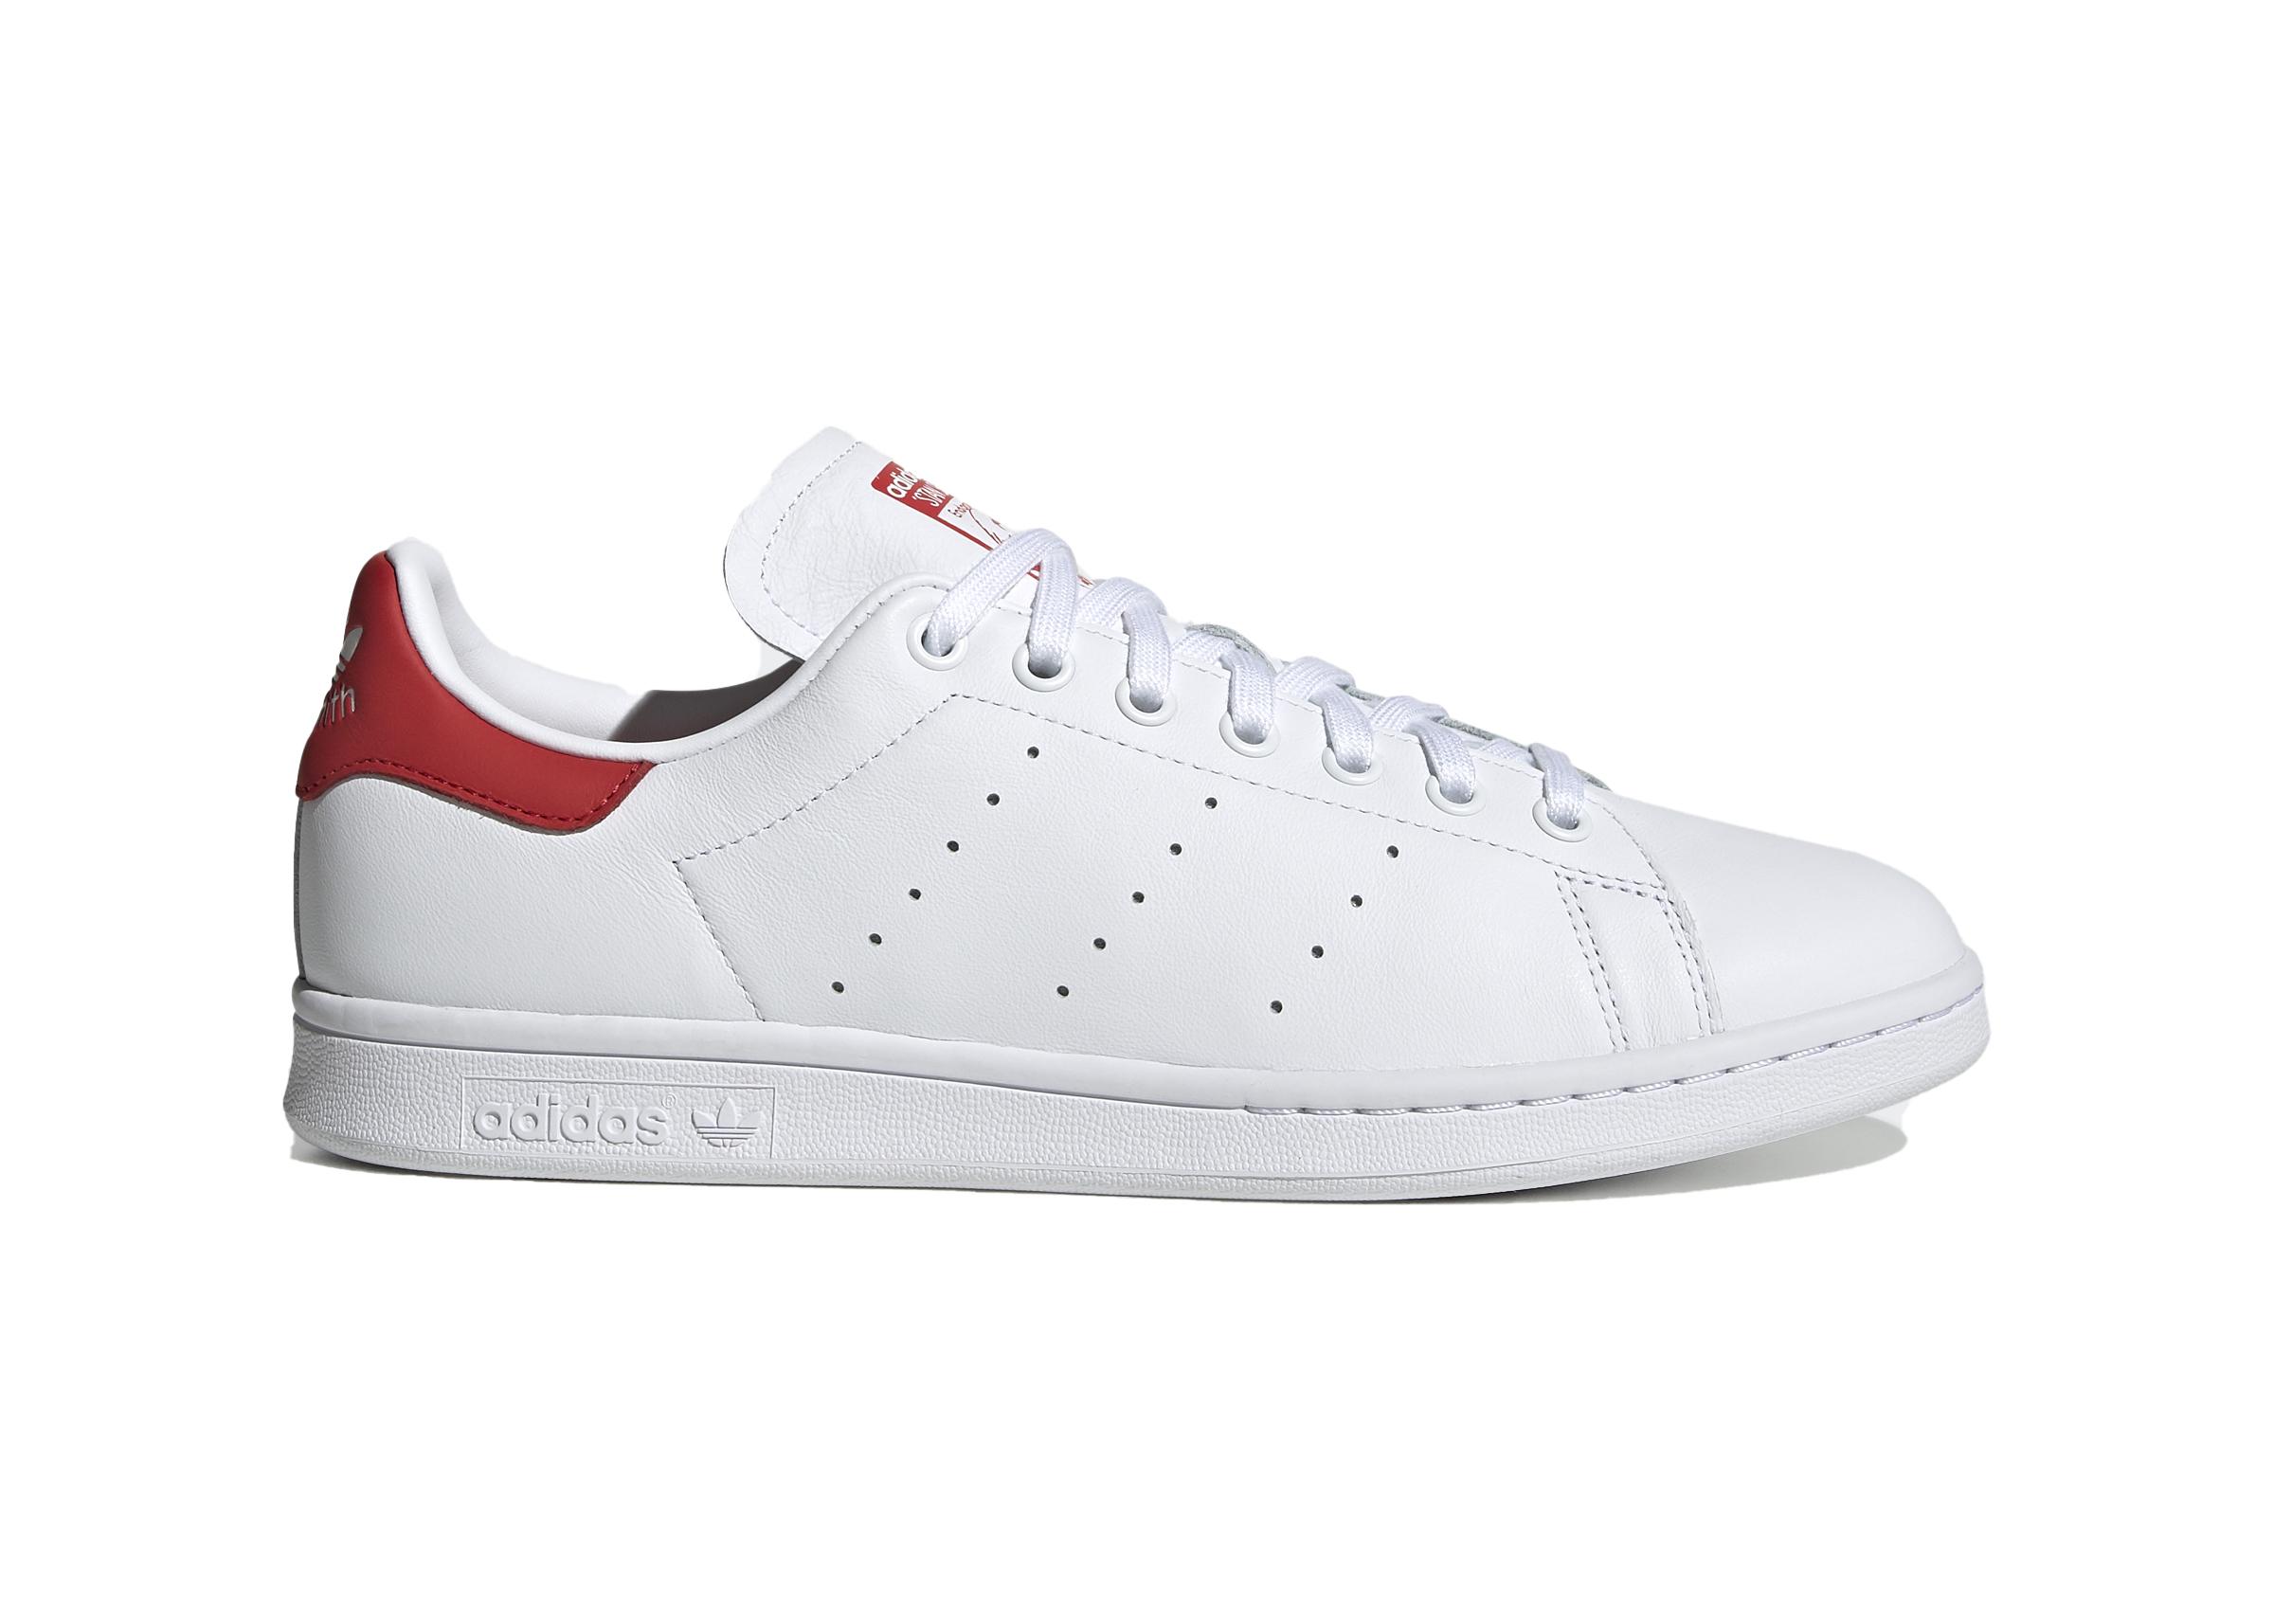 adidas Stan Smith Lush Red